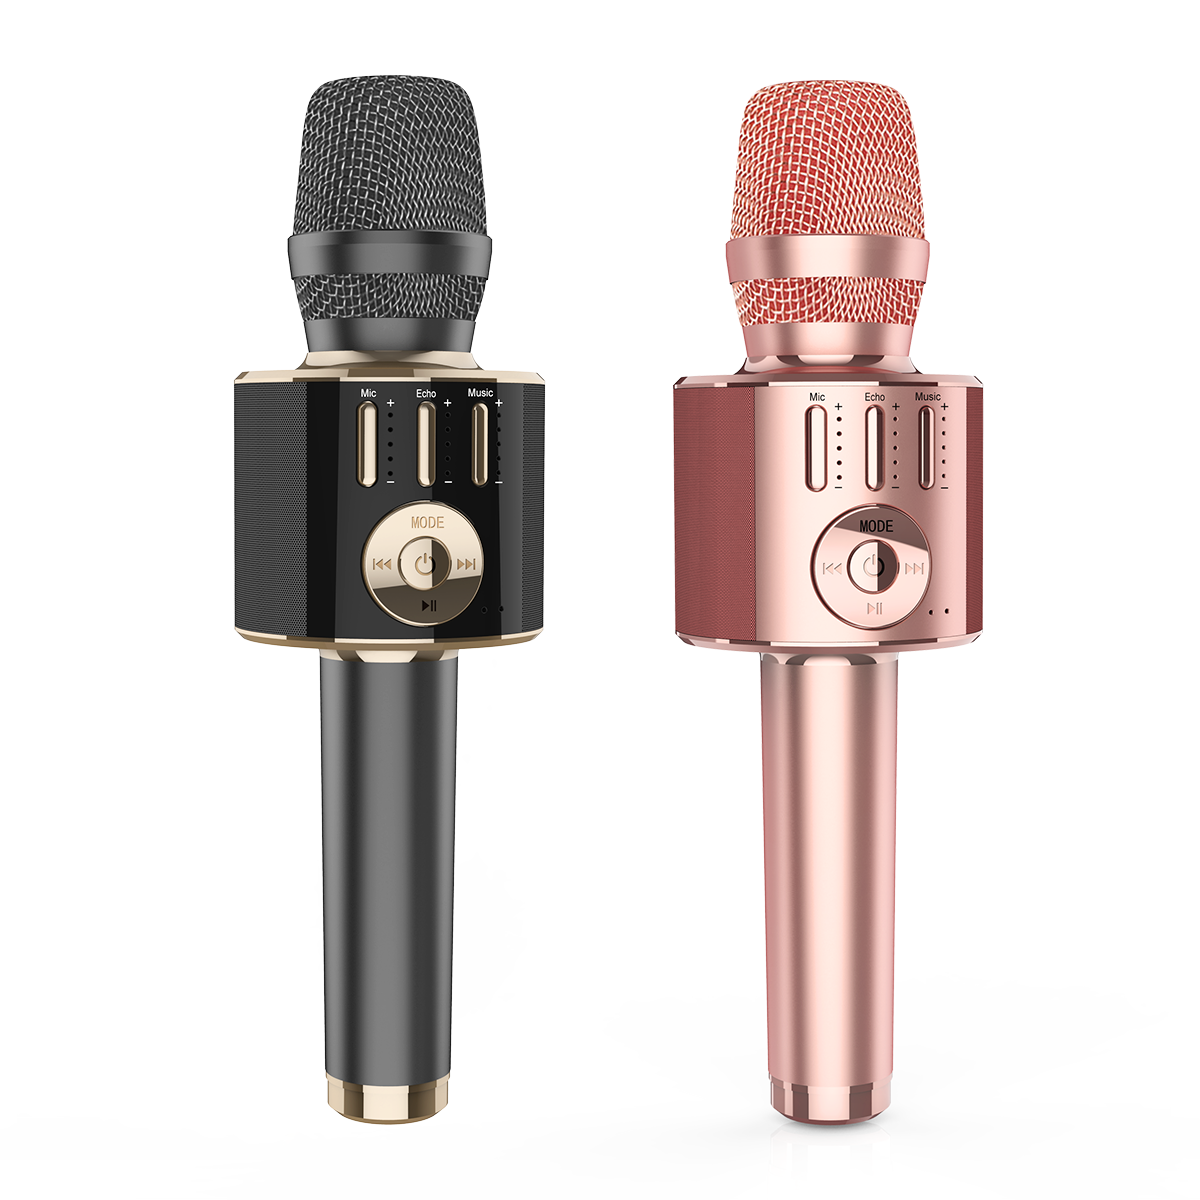 Gainstrong 7W 1800mAh handheld microphone karaoke support microphone karaoke wireless led and wireless bluetooth karaoke microph